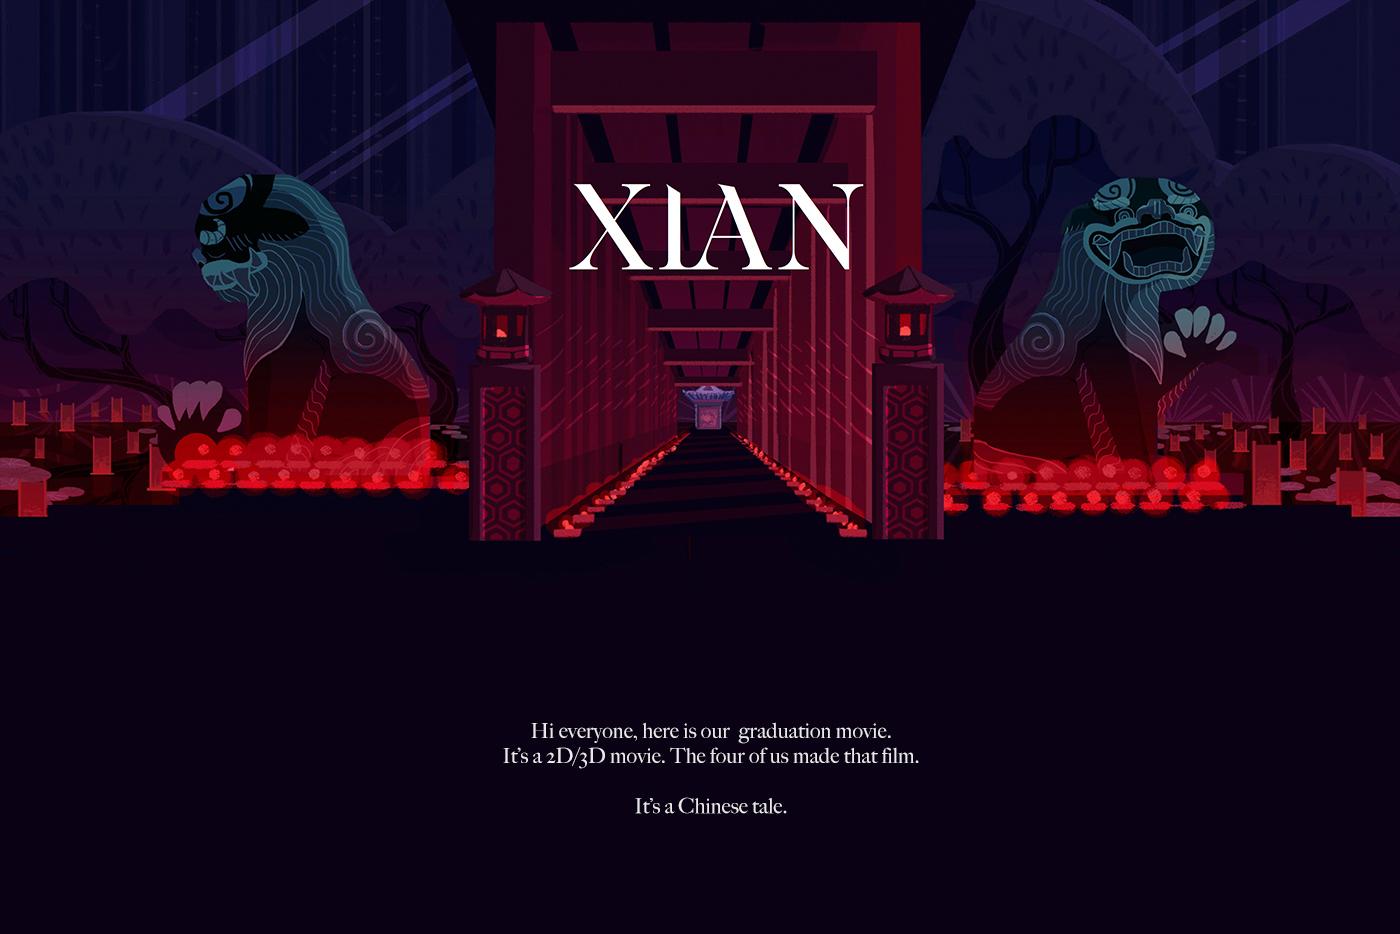 china xian movie emperor tale tiger animation  dragons painter garden